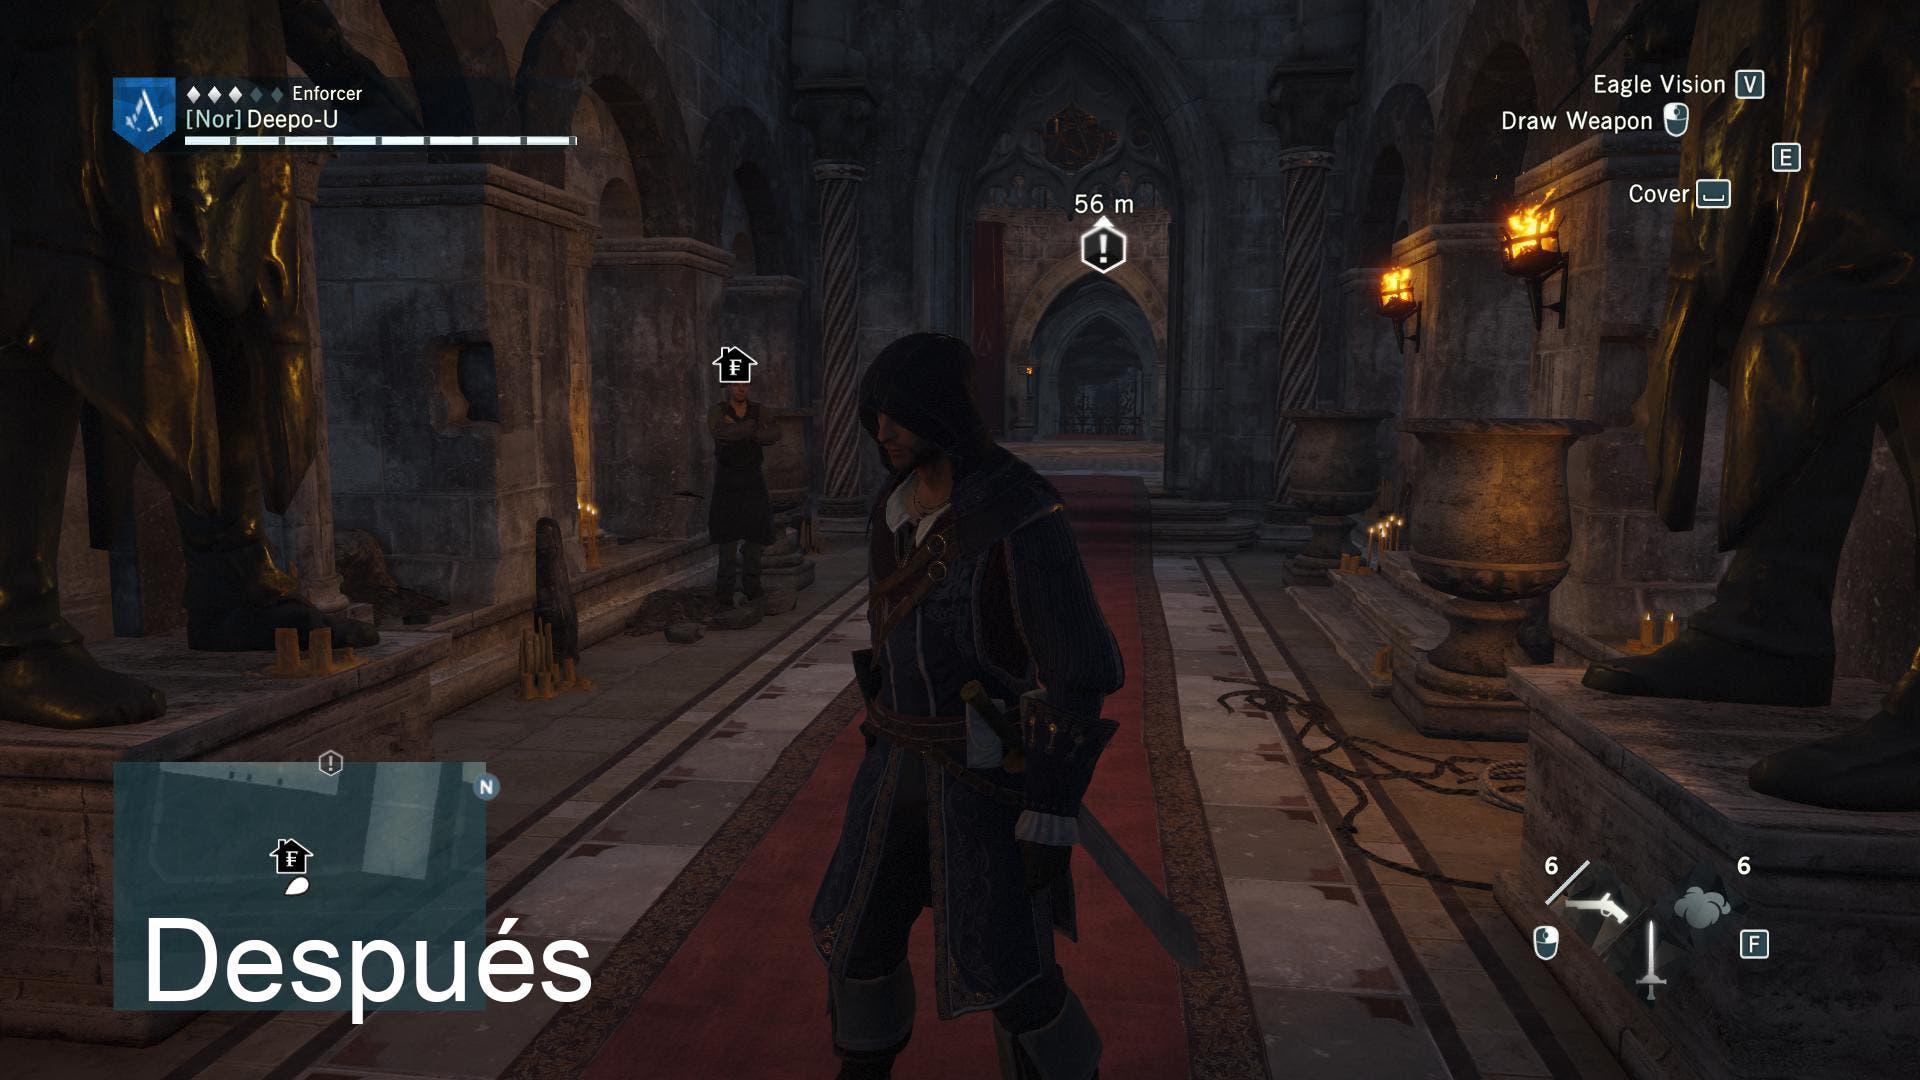 assassins-creed-unity-pc-comparison-screen-2